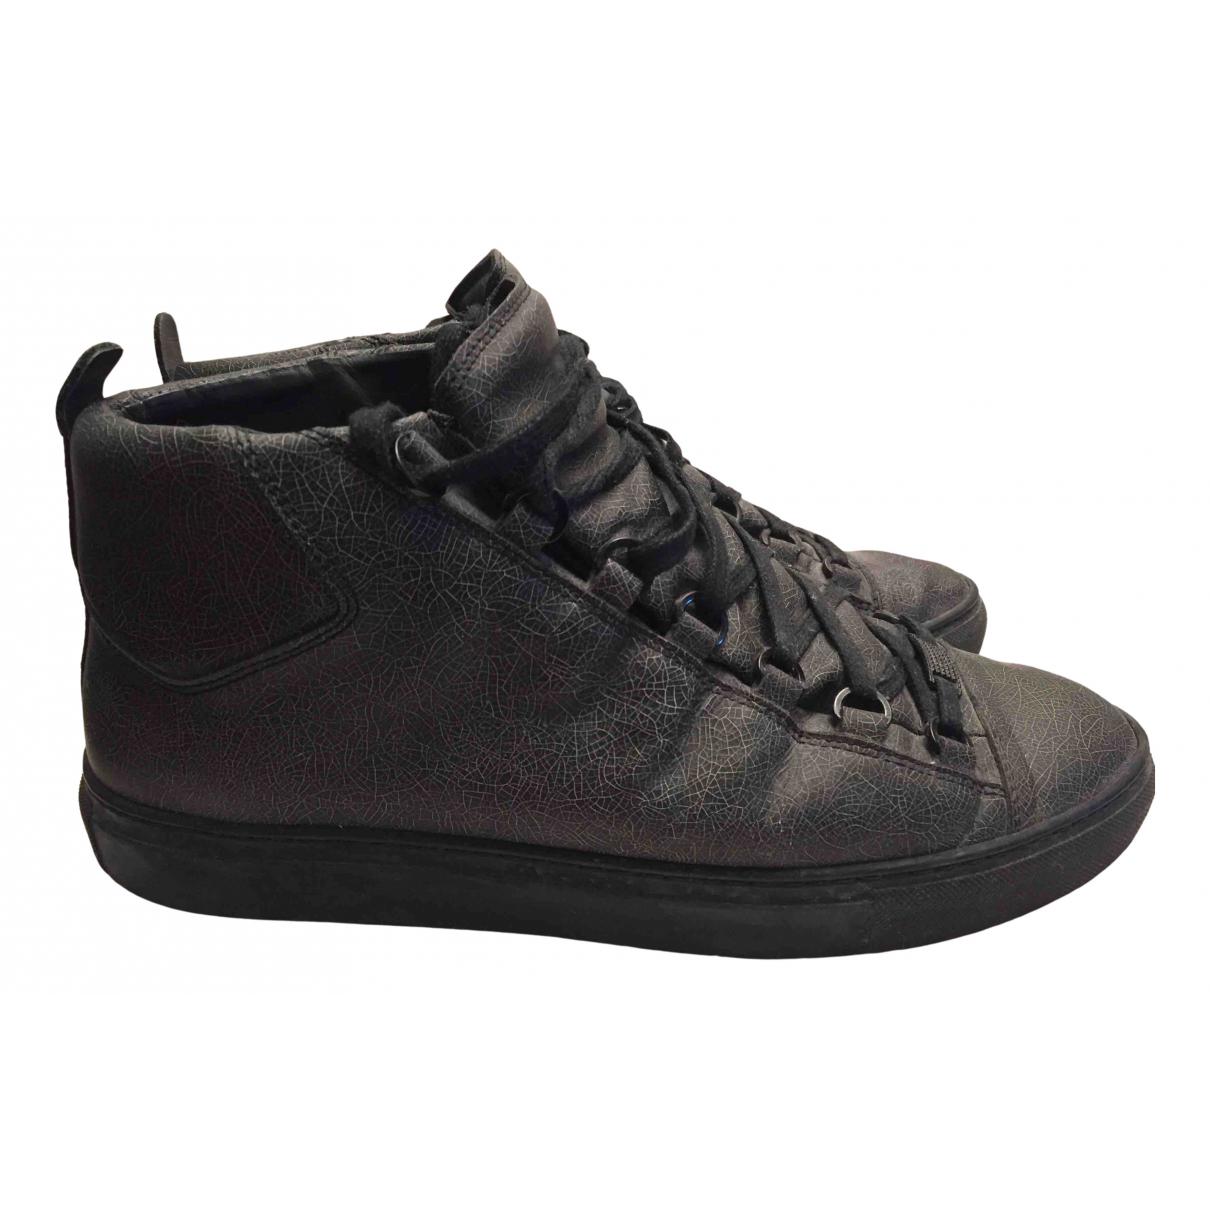 Balenciaga Arena Sneakers in  Grau Exotenleder